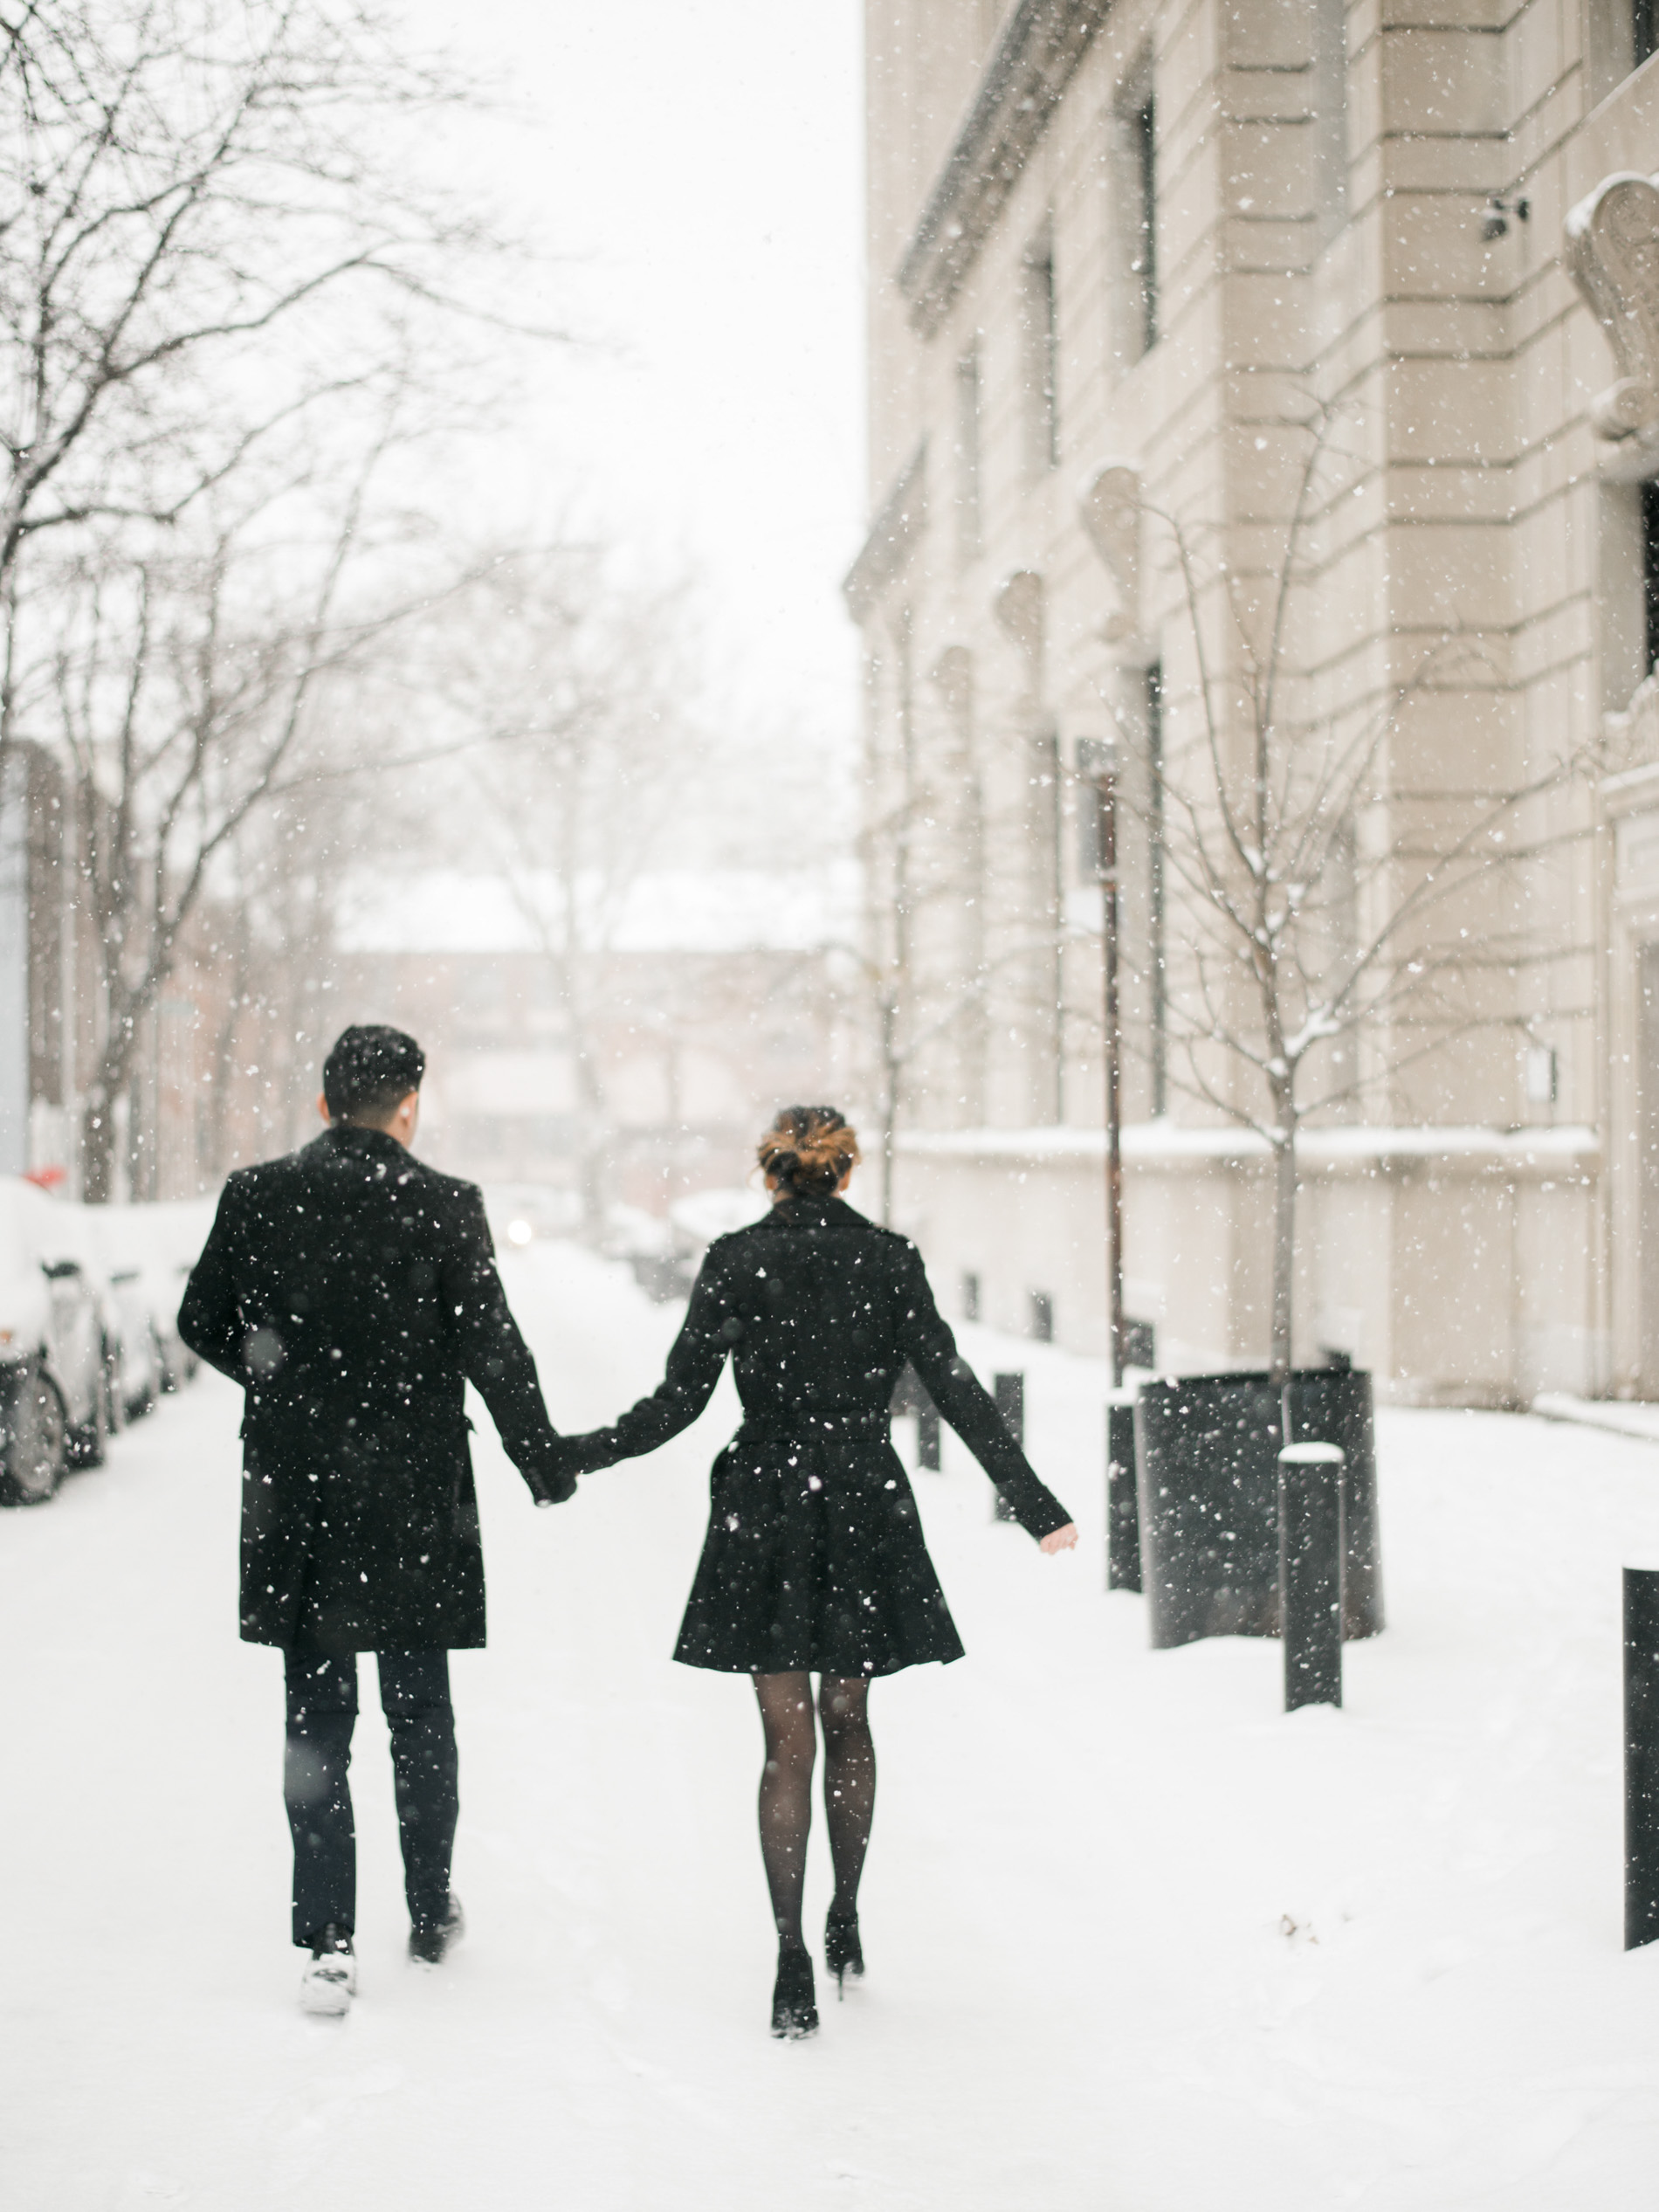 20170112 du soleil photographie philadelphia snowy winter engagement session jessica thomas 41 - car barn georgetown wedding